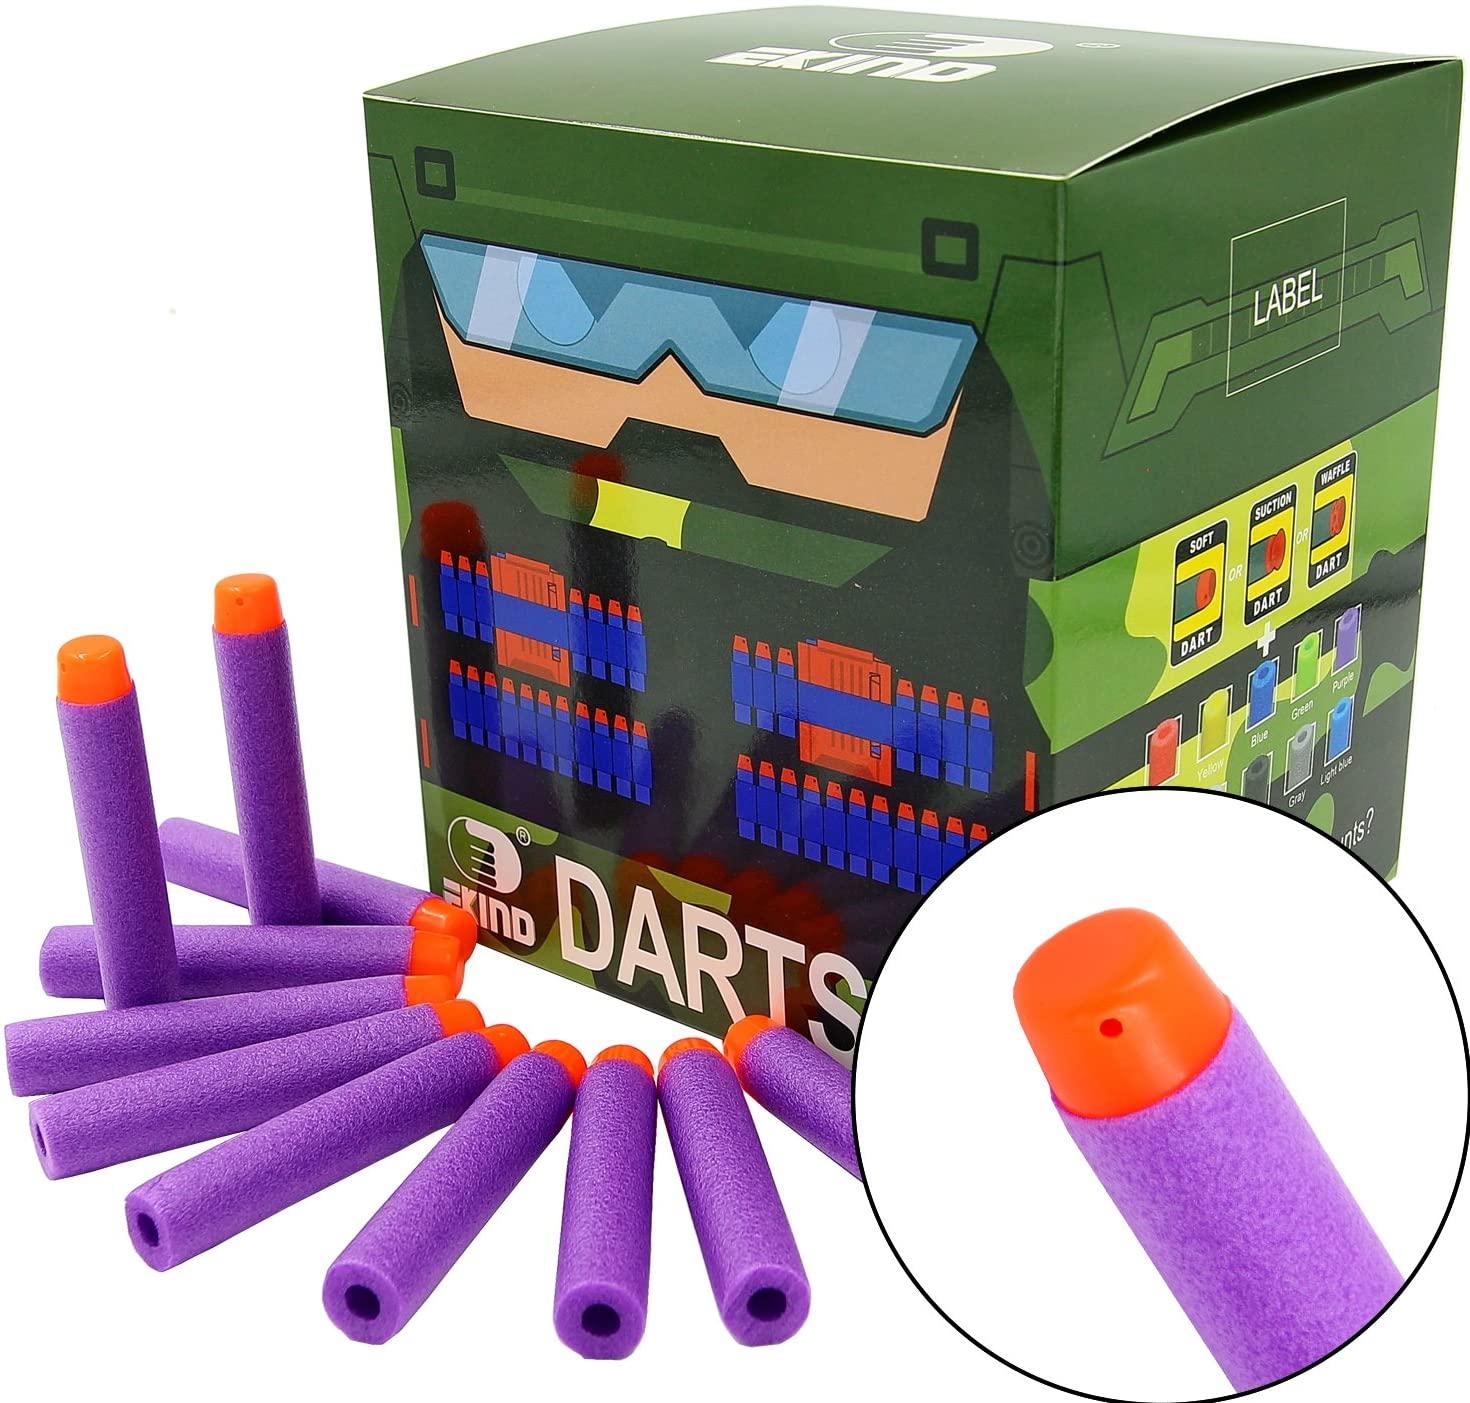 EKIND 200Pcs Darts Refill Foam Bullet Compatible for Nerf N-Strike Elite Guns